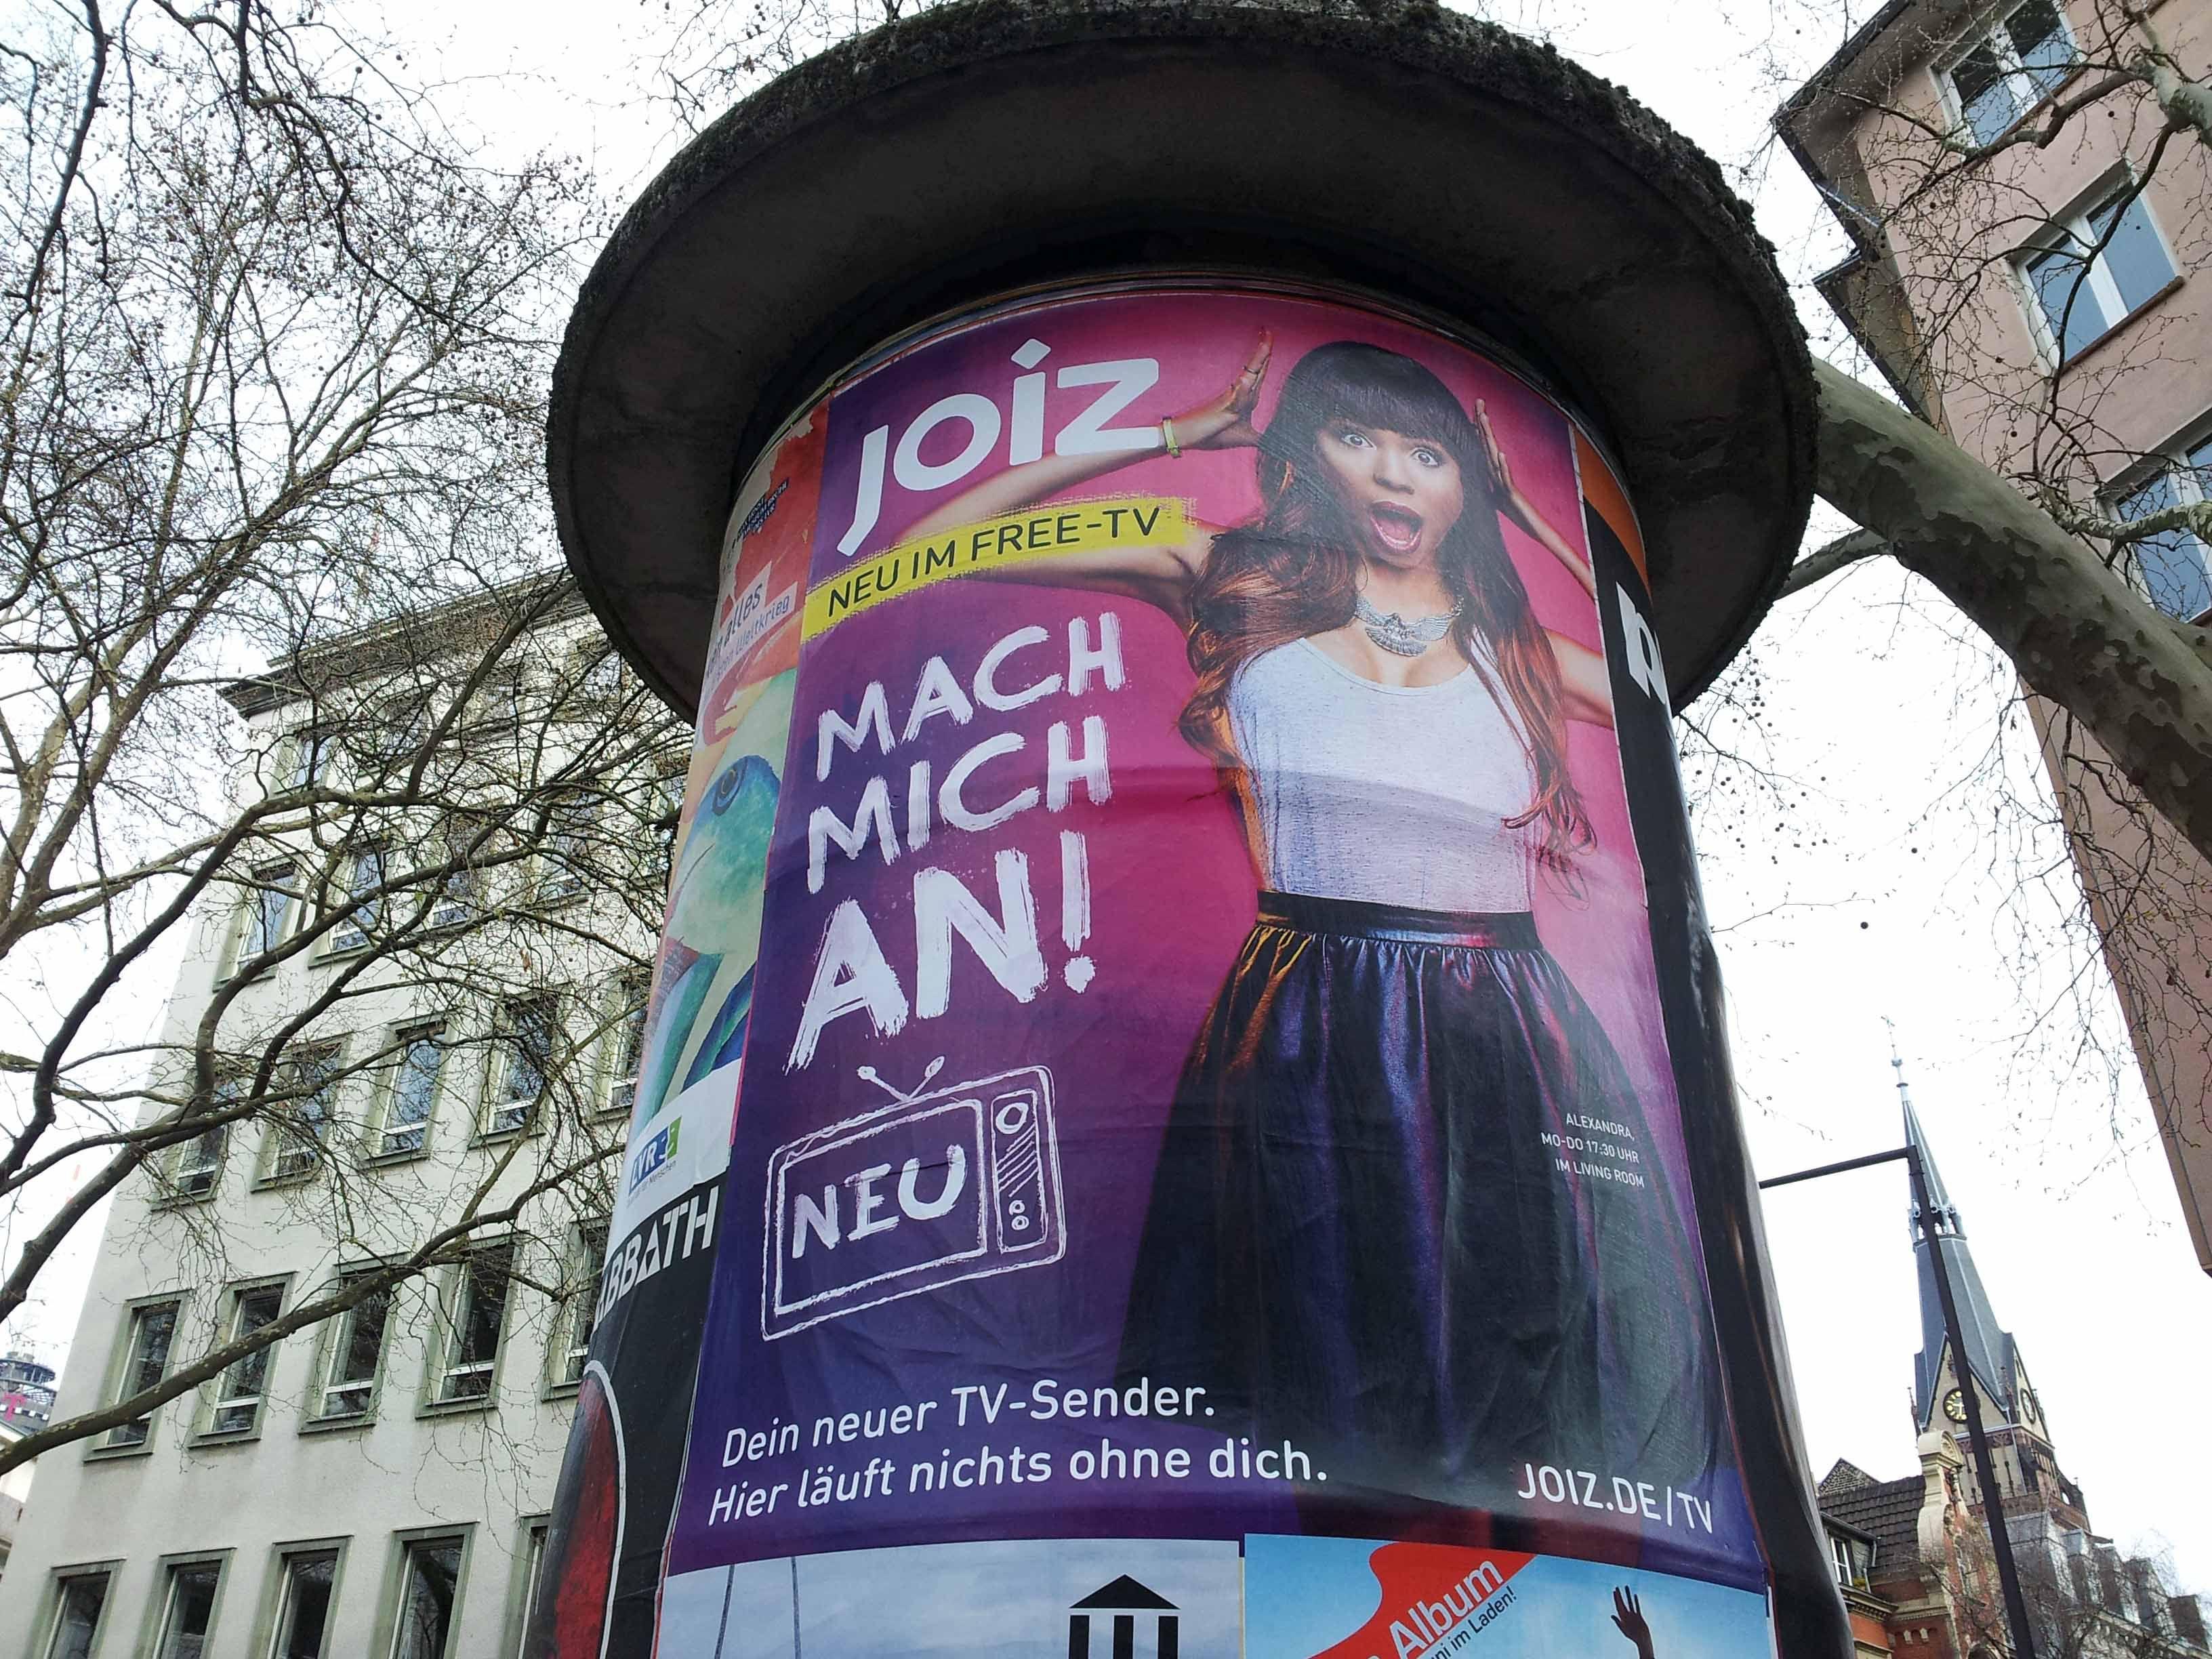 Joiz TV . Frühjahr 2014